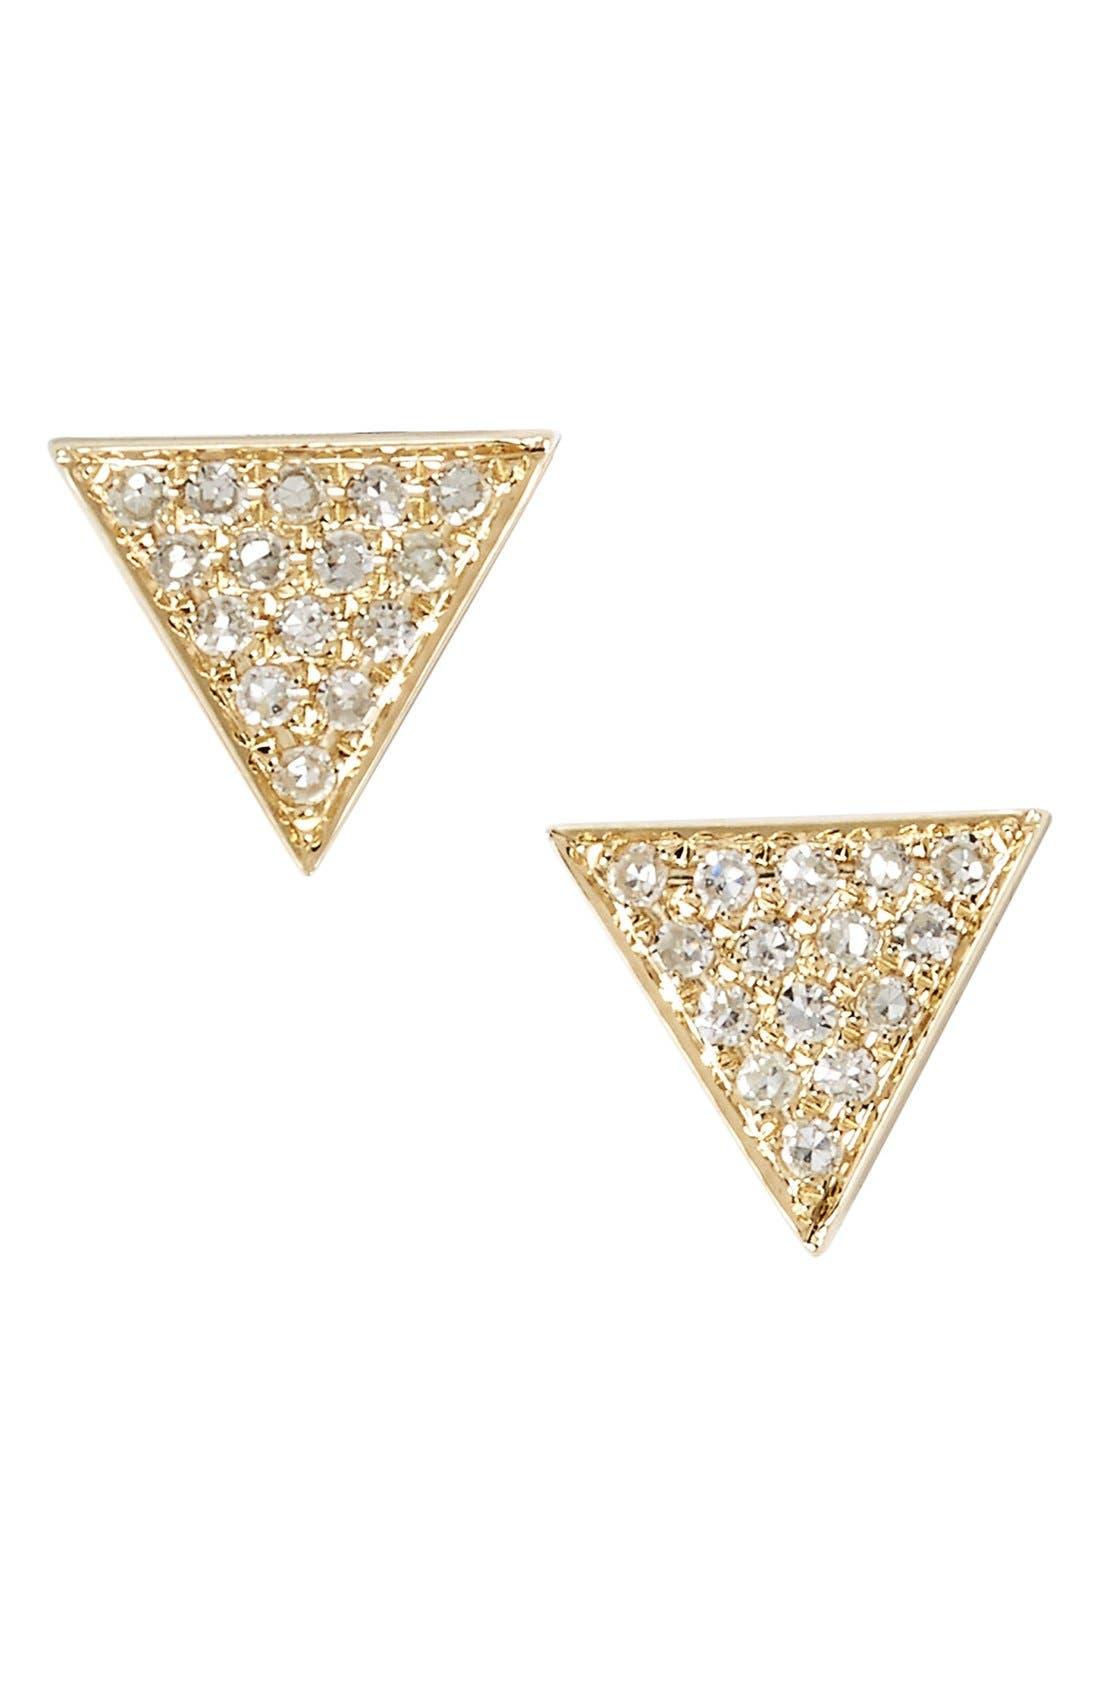 'Emily Sarah' Diamond Pavé Triangle Stud Earrings,                         Main,                         color, YELLOW GOLD